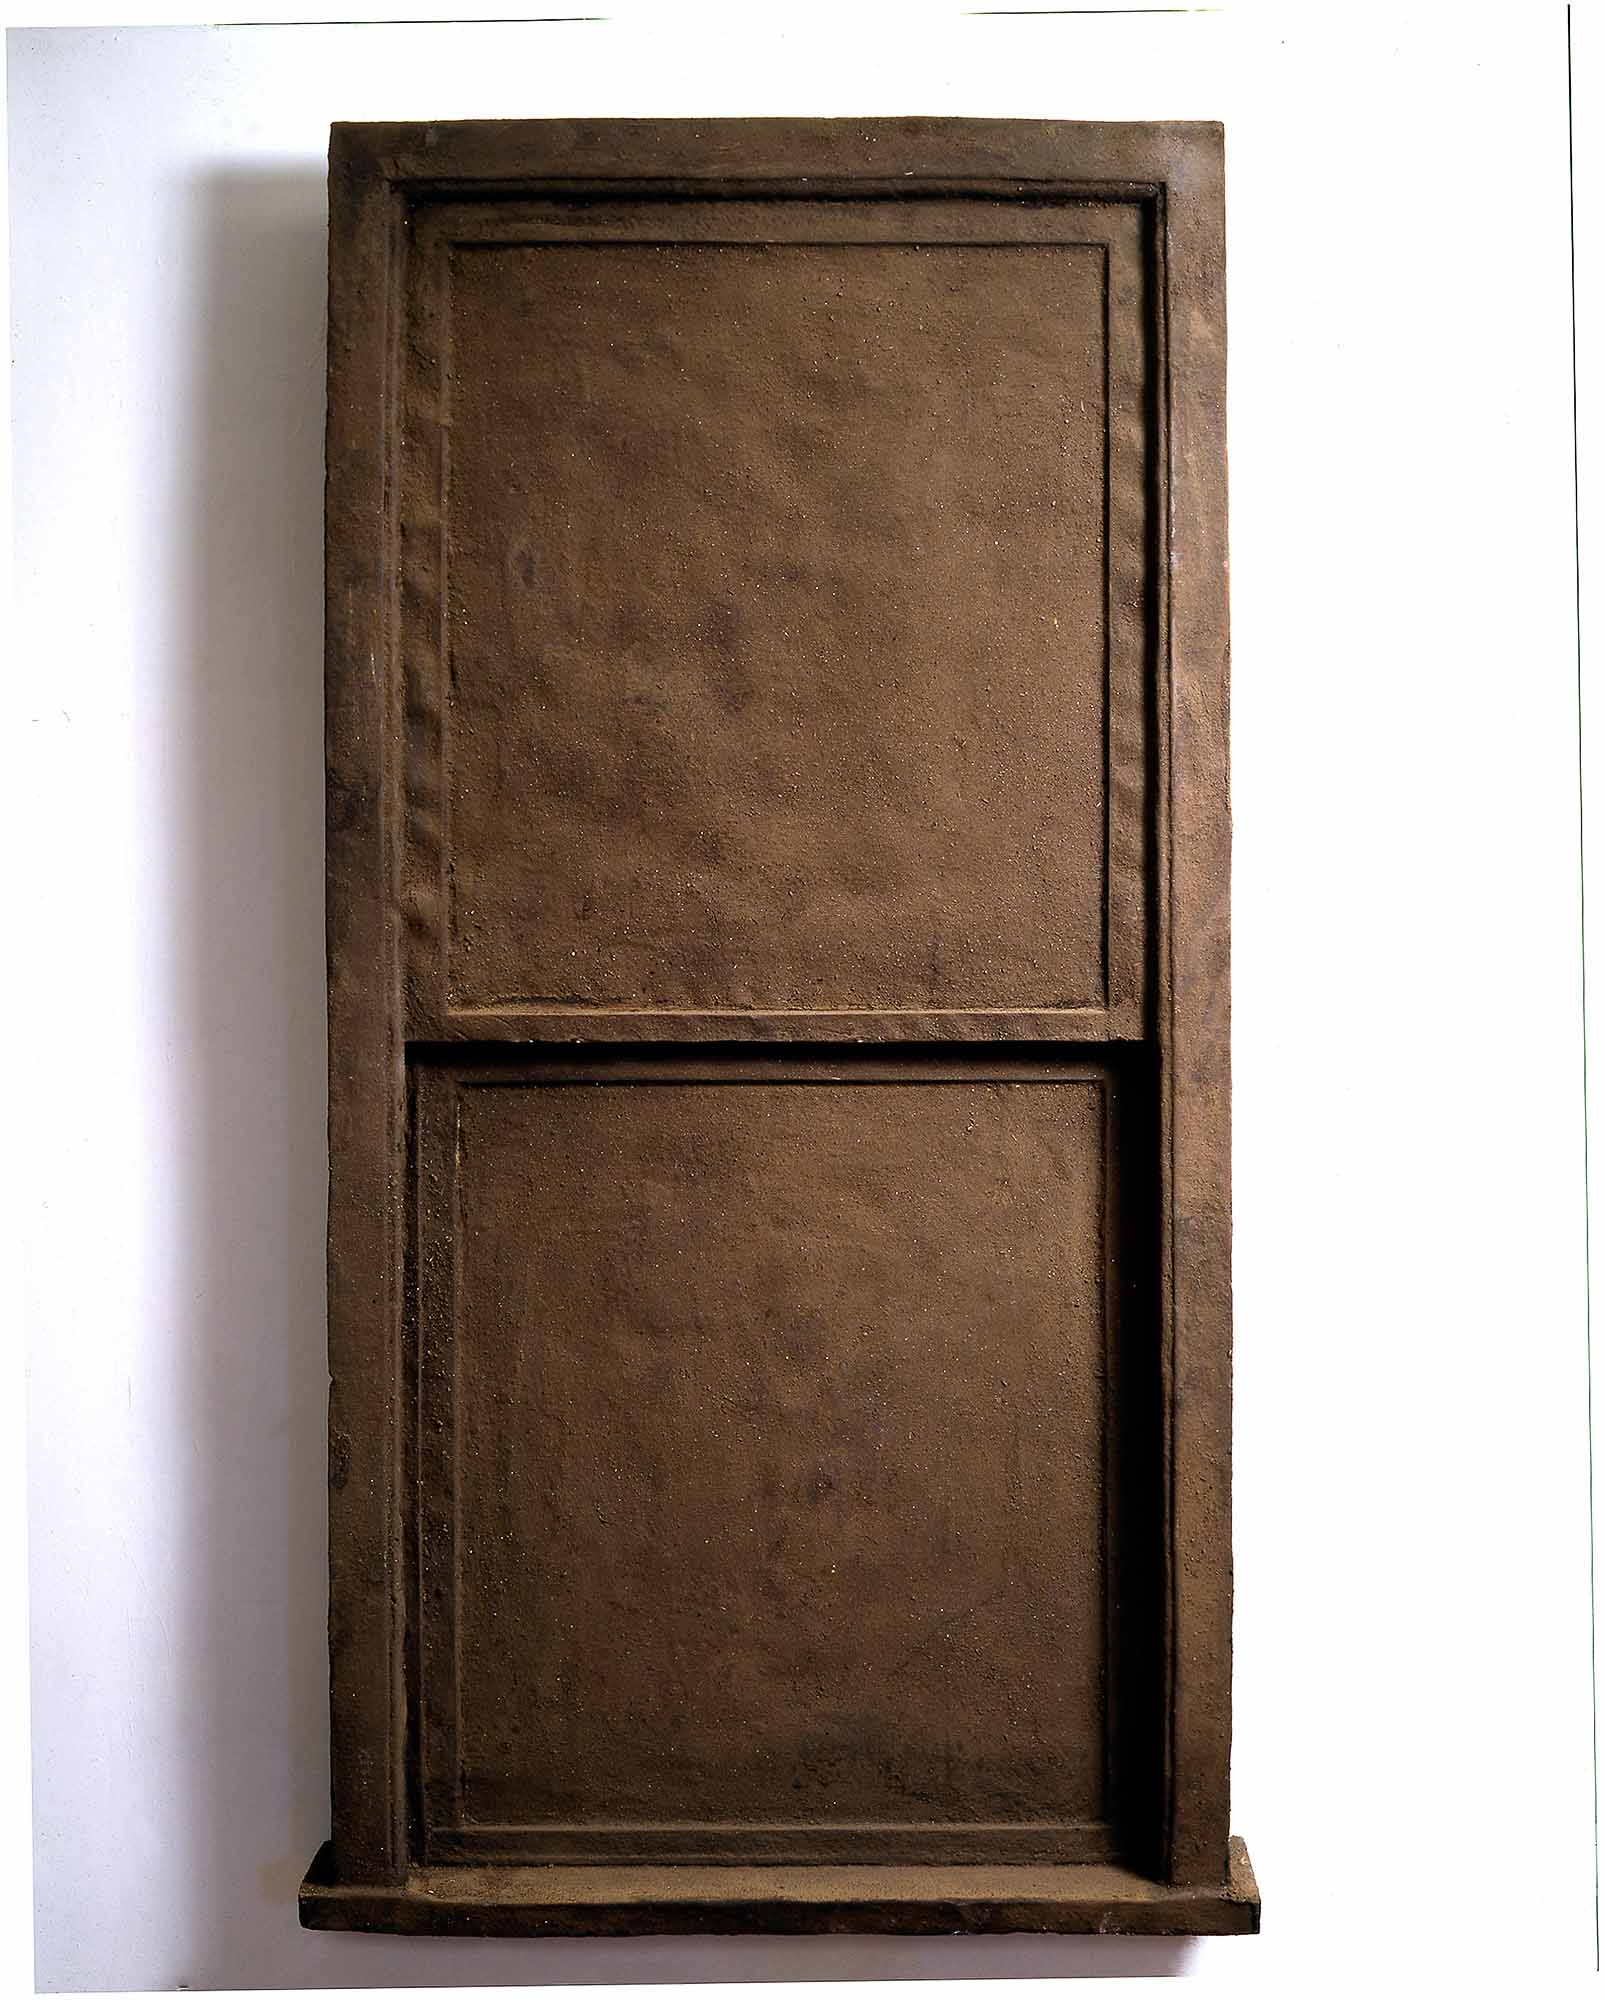 Window Series #1, 1991.